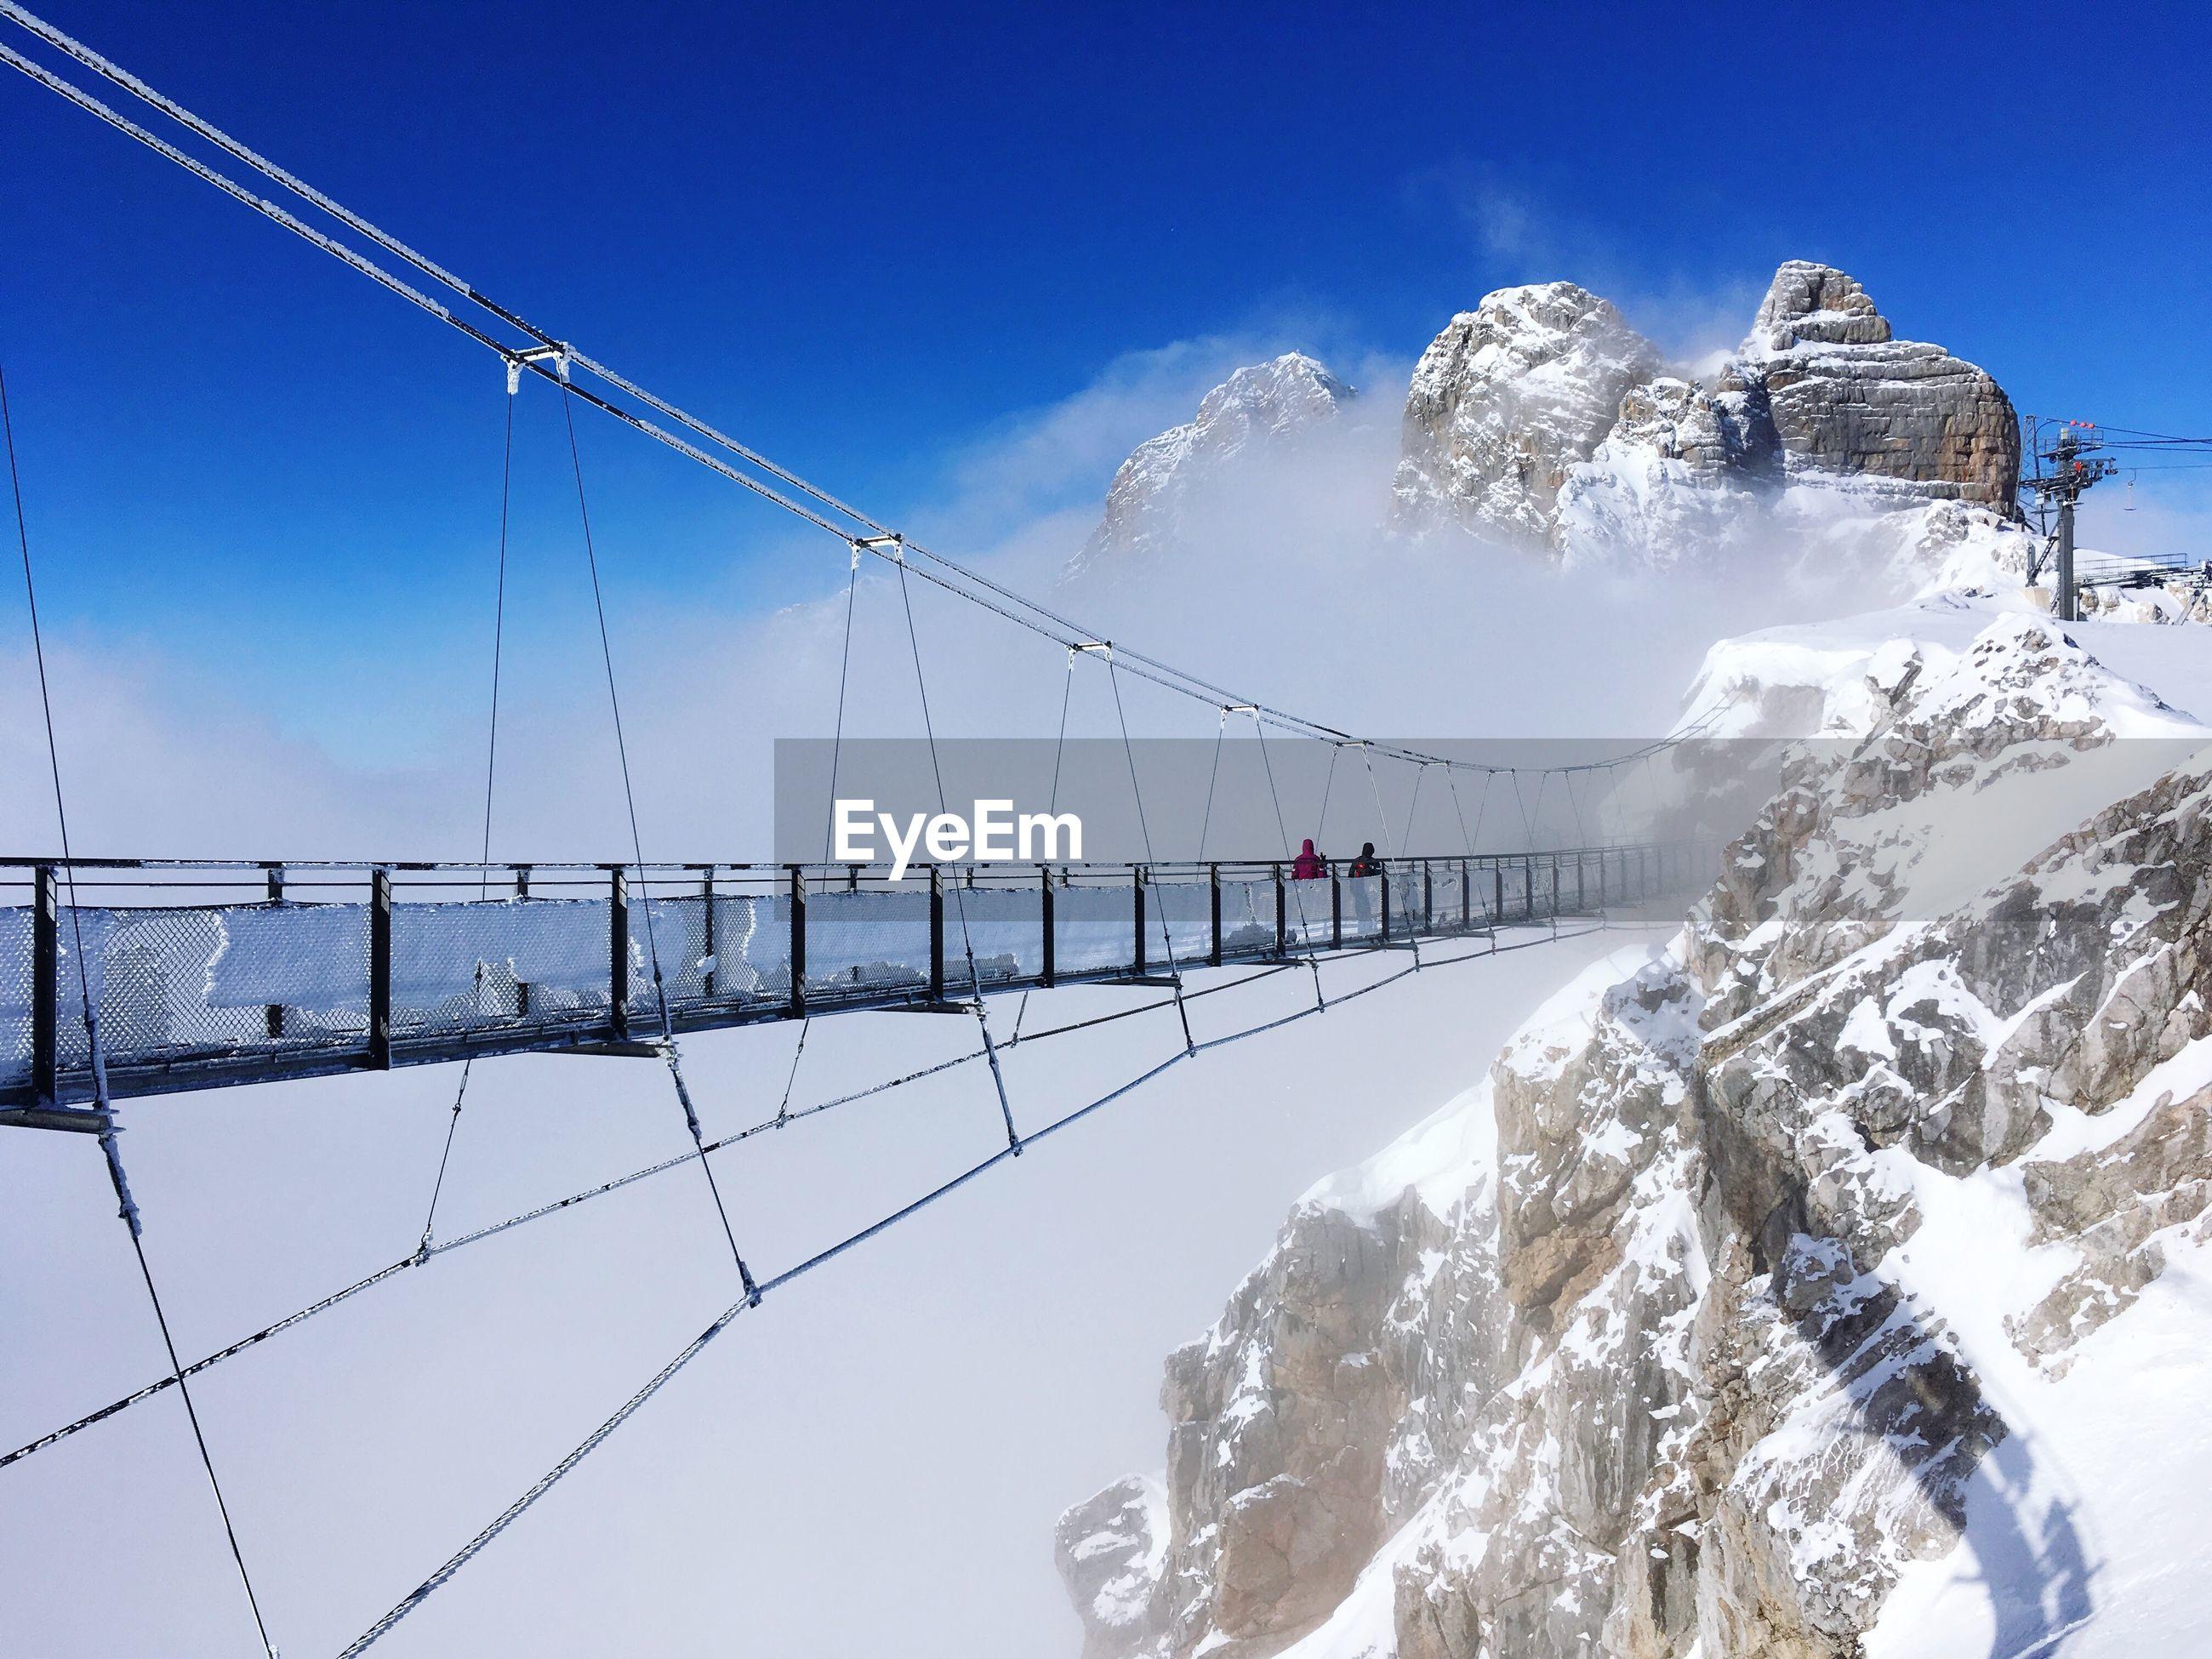 SNOW COVERED BRIDGE AGAINST SKY